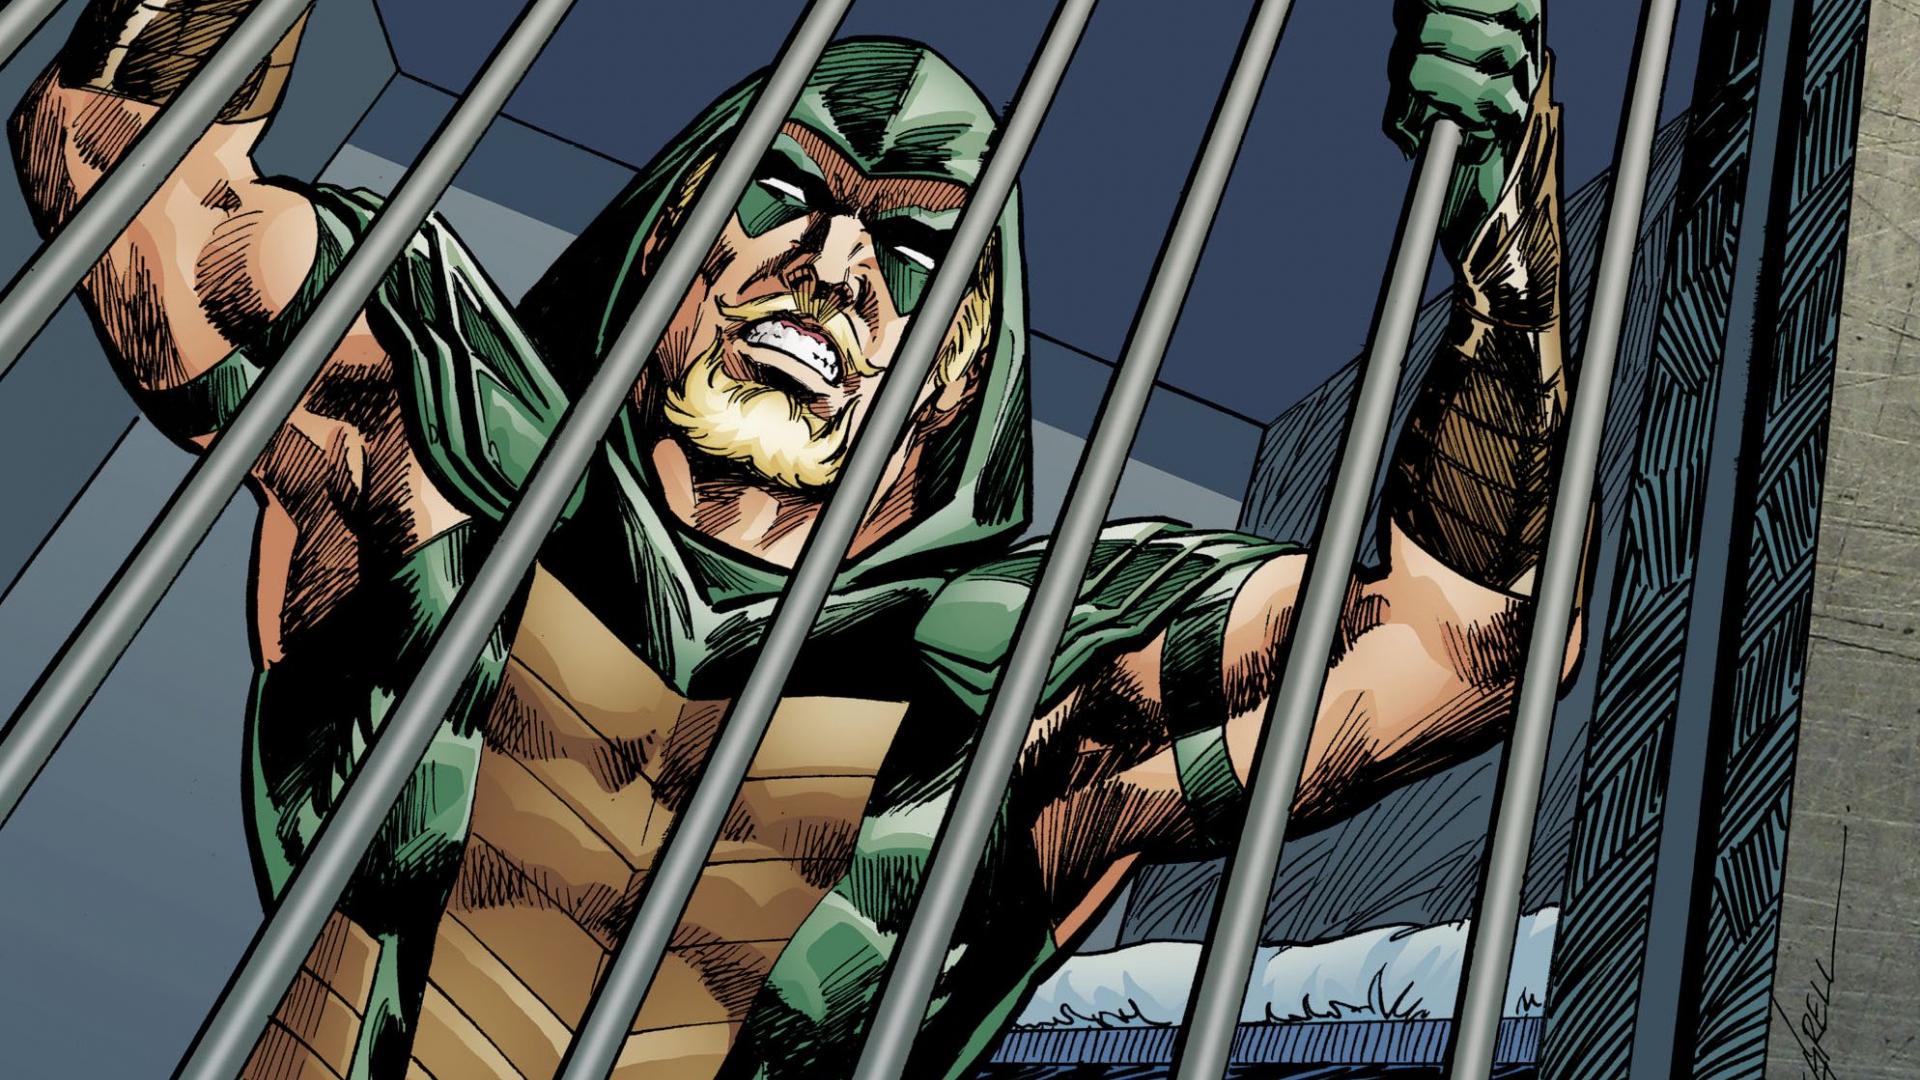 1920x1080 Wallpaper Behind Bar Green Arrow Superhero